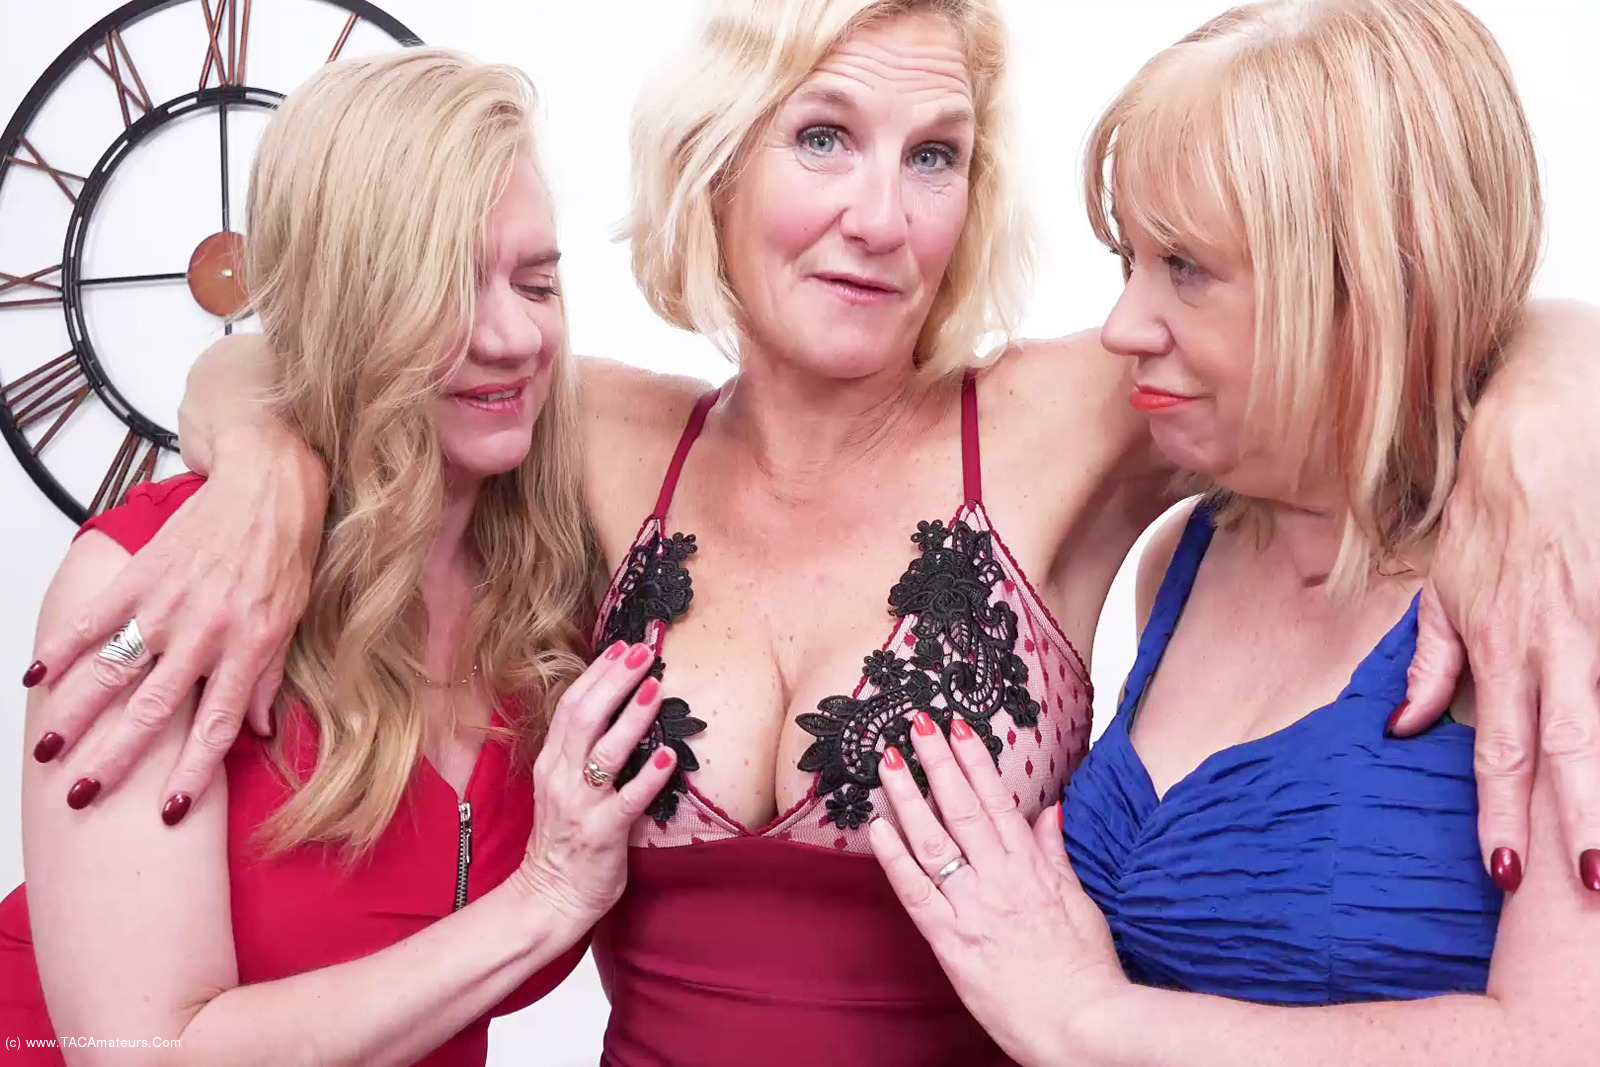 MollyMILF - Three Girls On The Table Pt1 scene 1